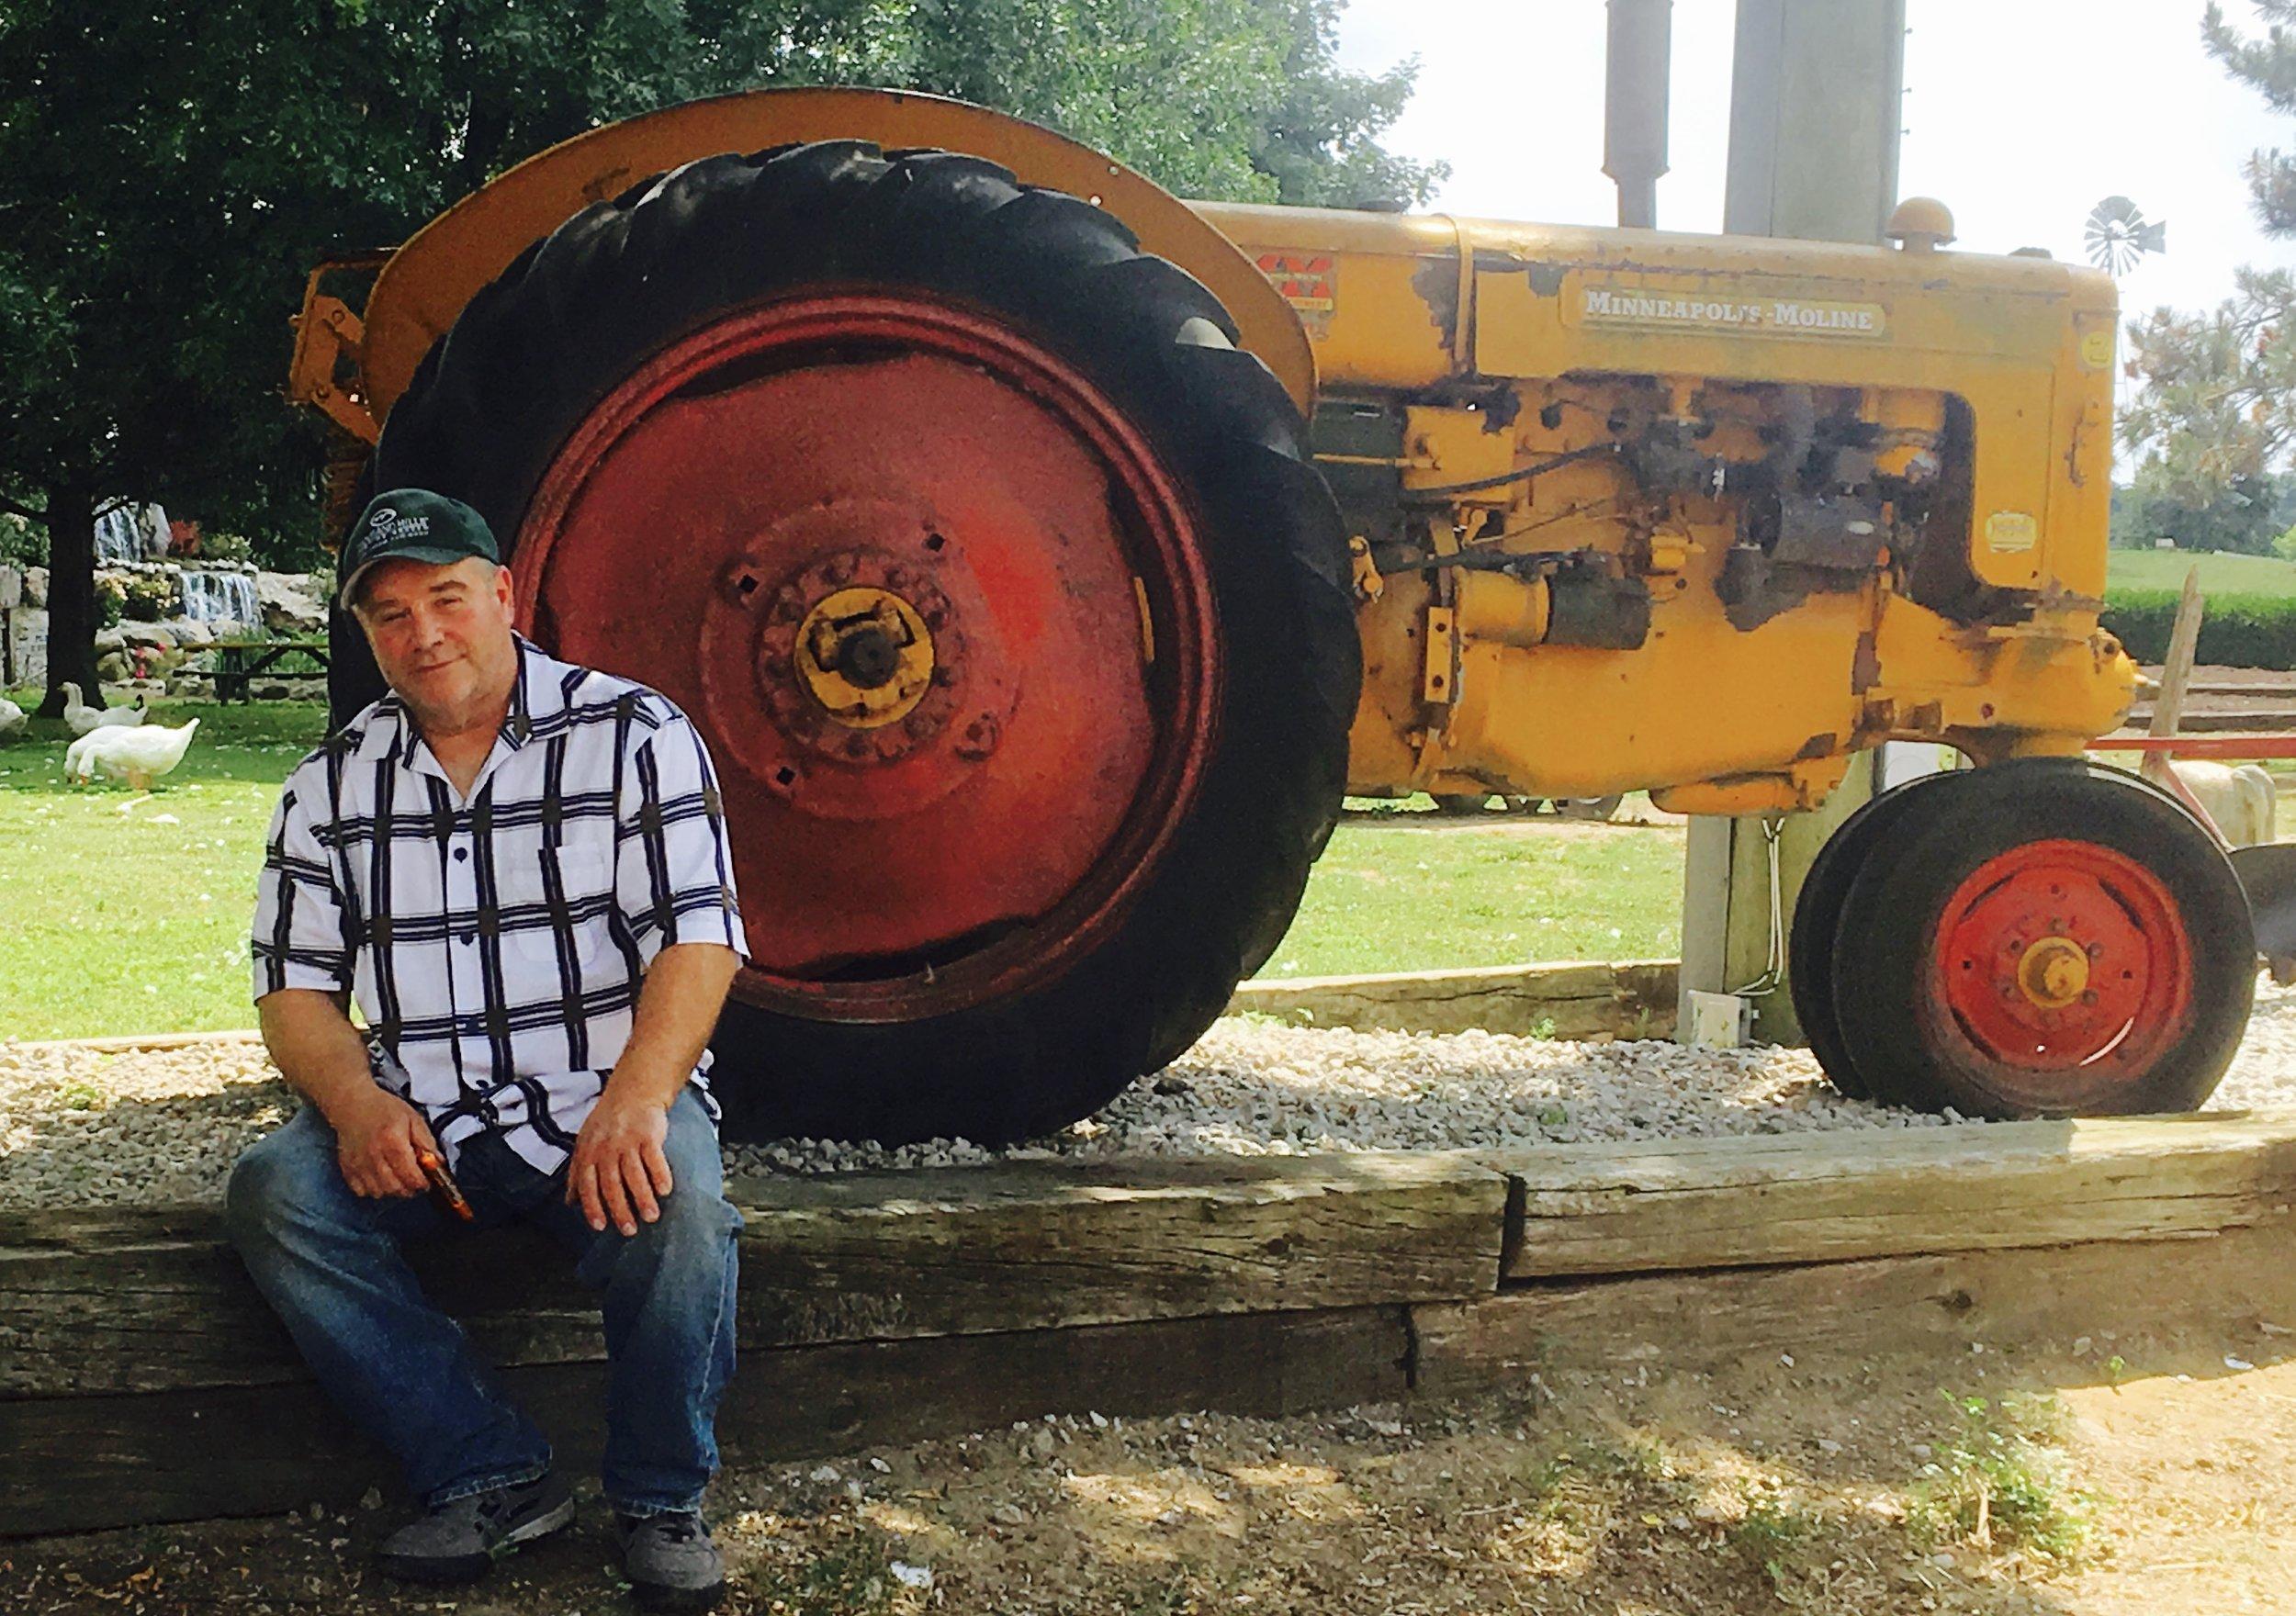 Garry VISITING CALDER'S FARM